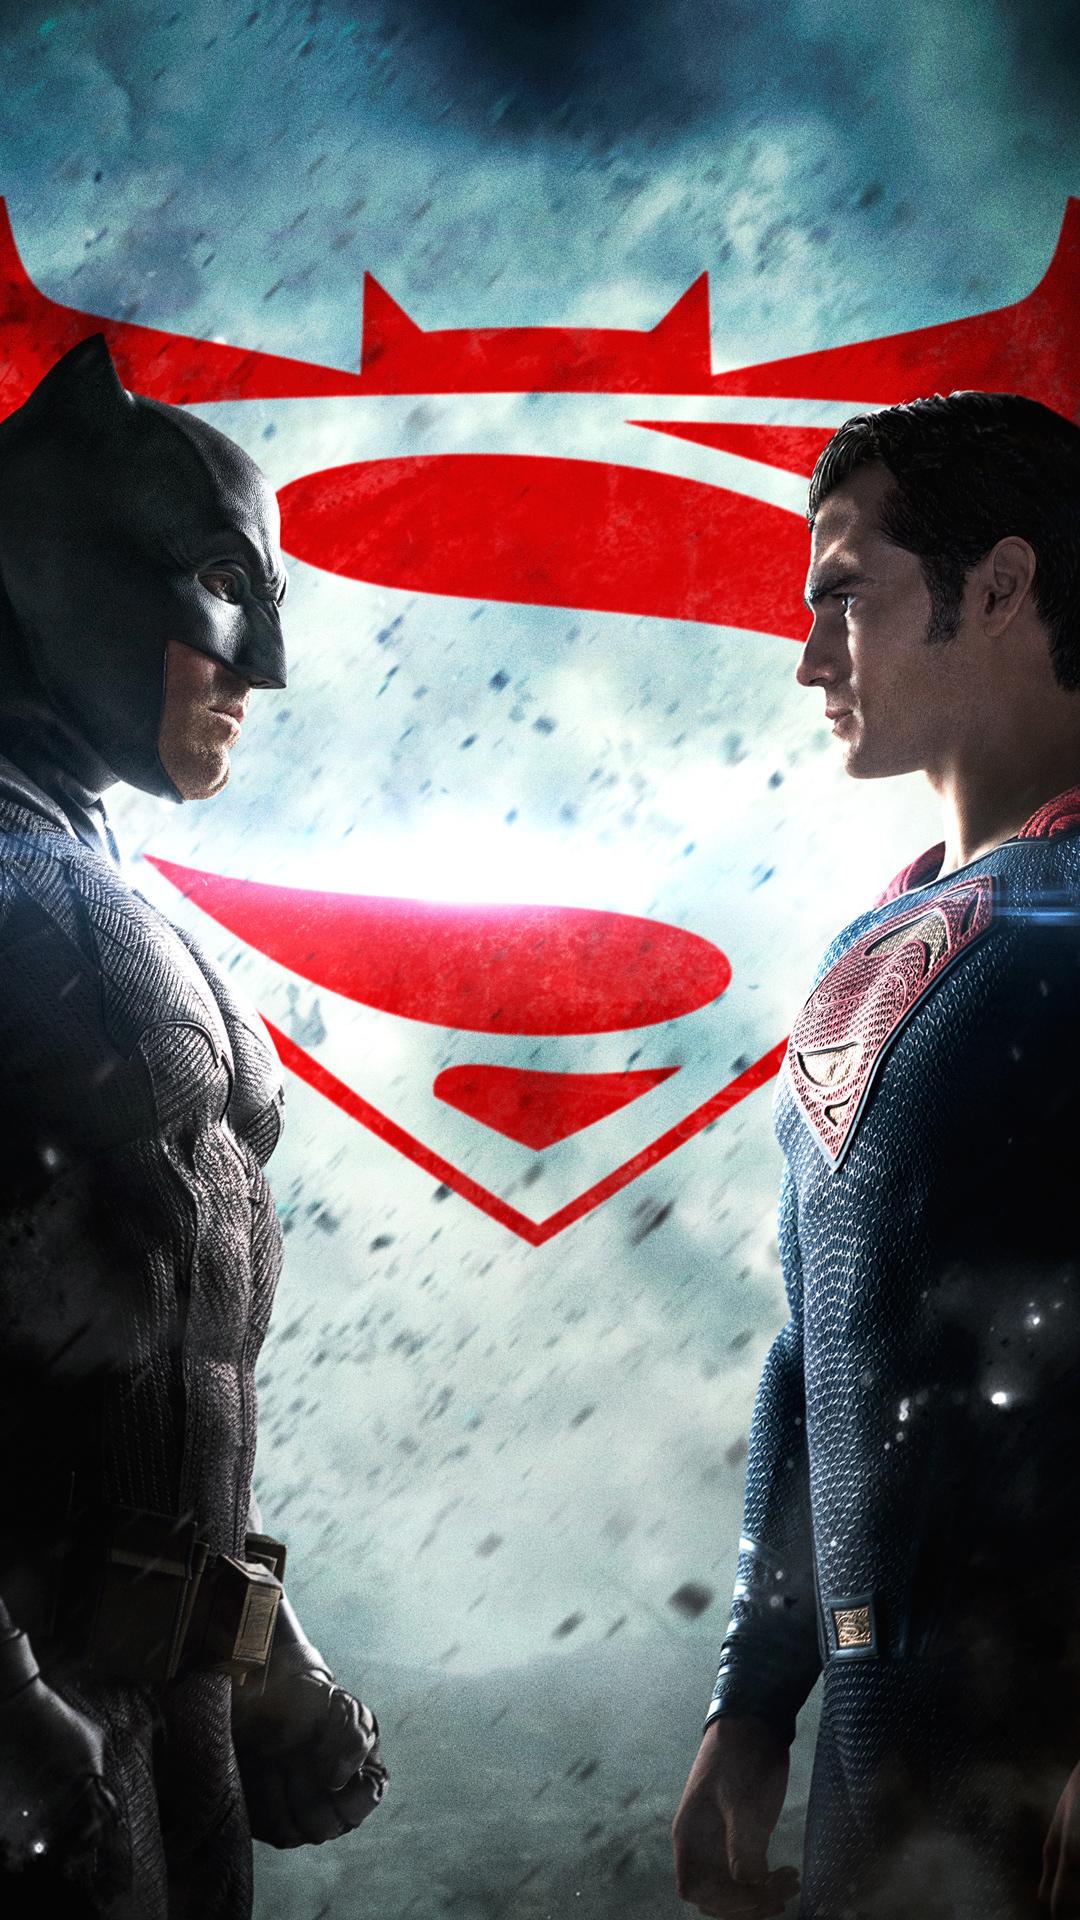 Photos Batman Iphone Wallpaper High Quality - Batman Vs Superman Hd Wallpaper For Mobile - HD Wallpaper